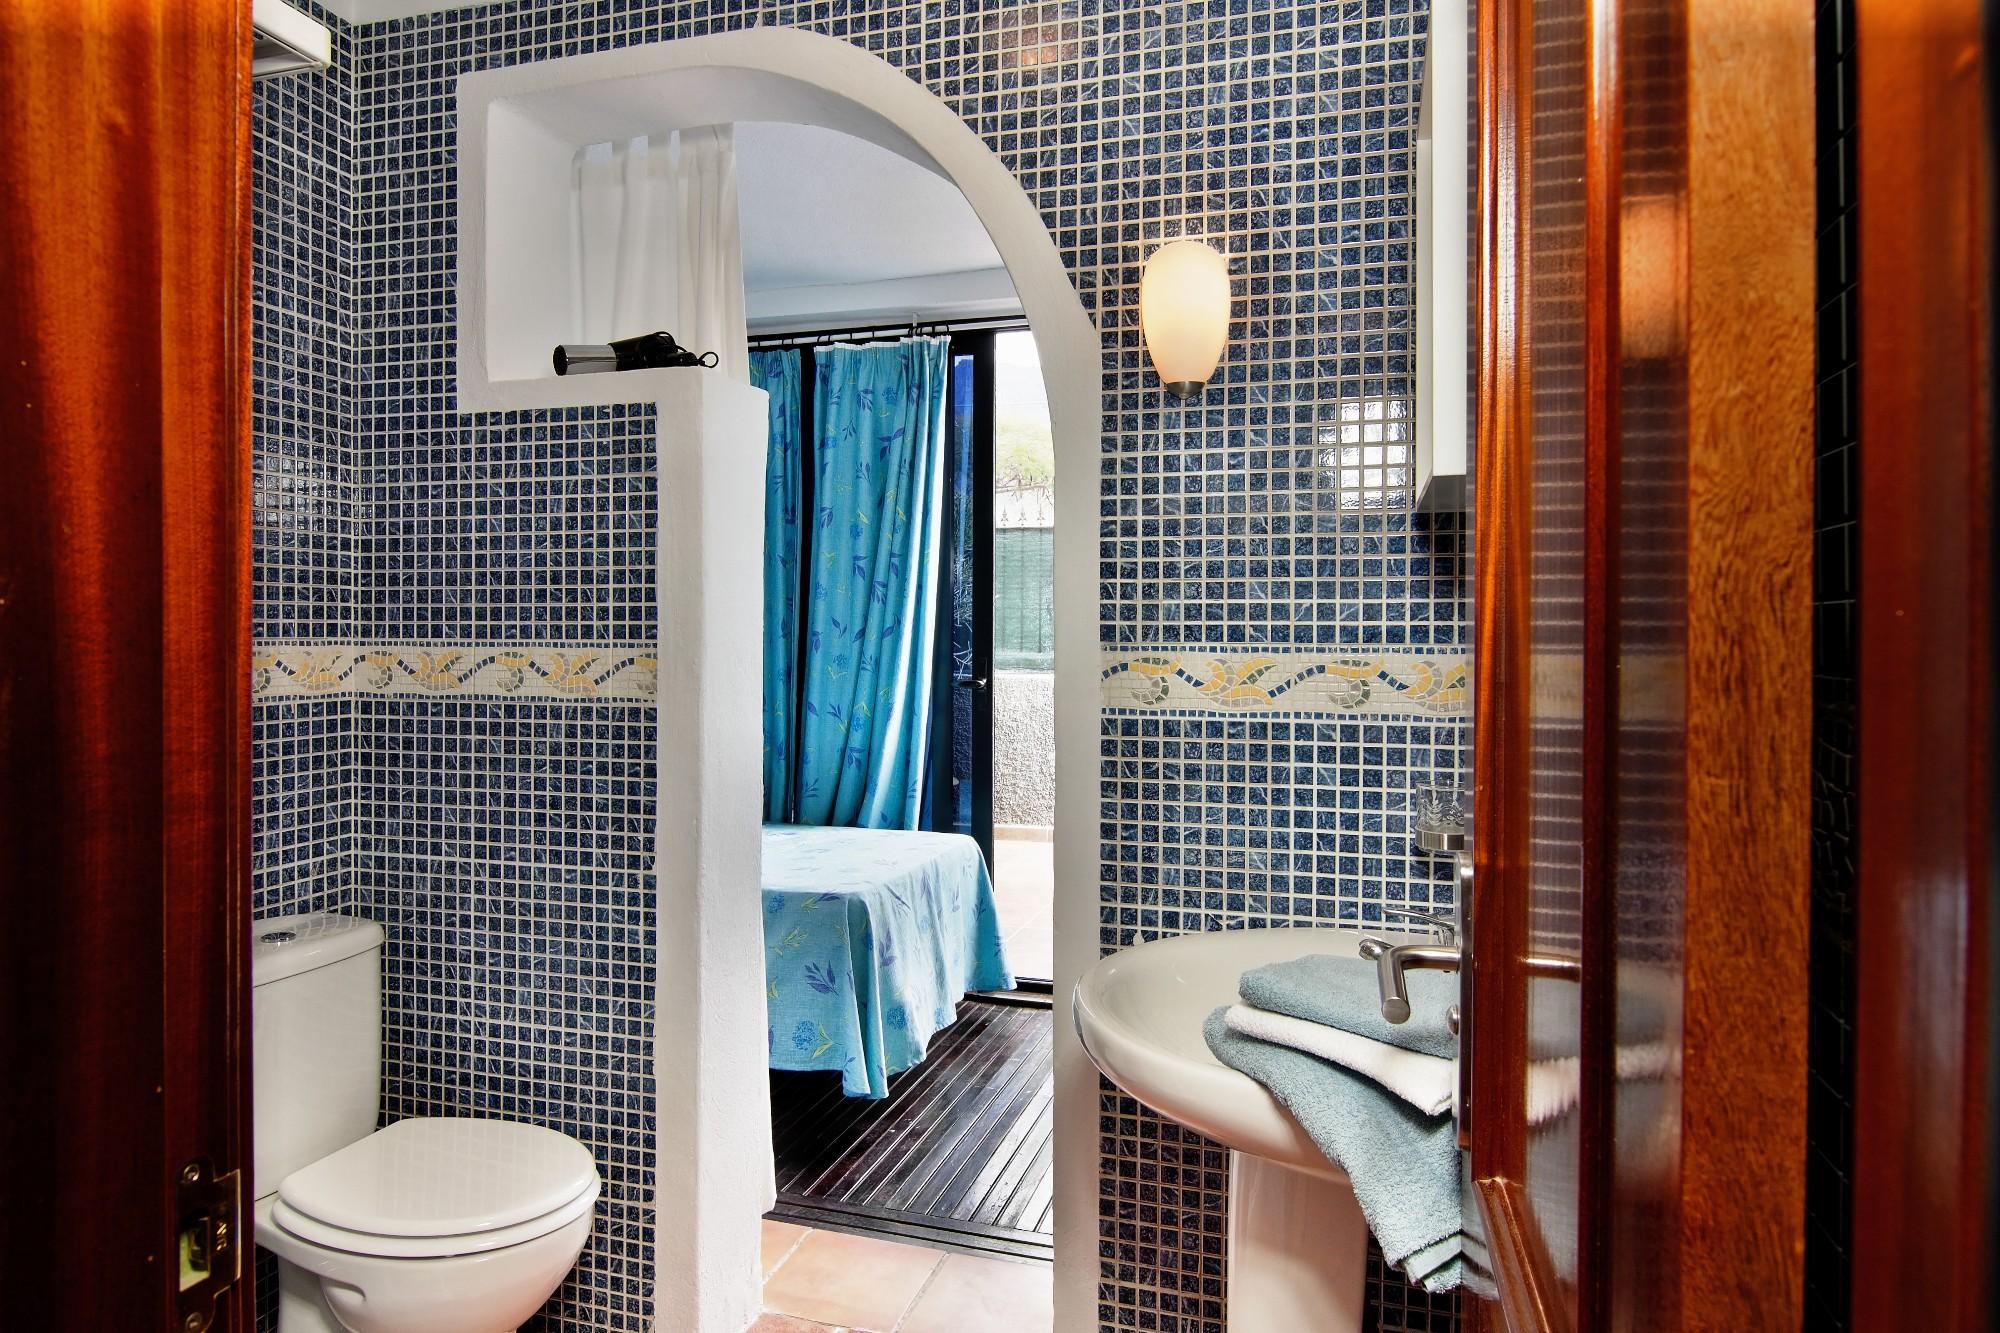 Badezimmer 1 Ferienhaus Adeje Teneriffa